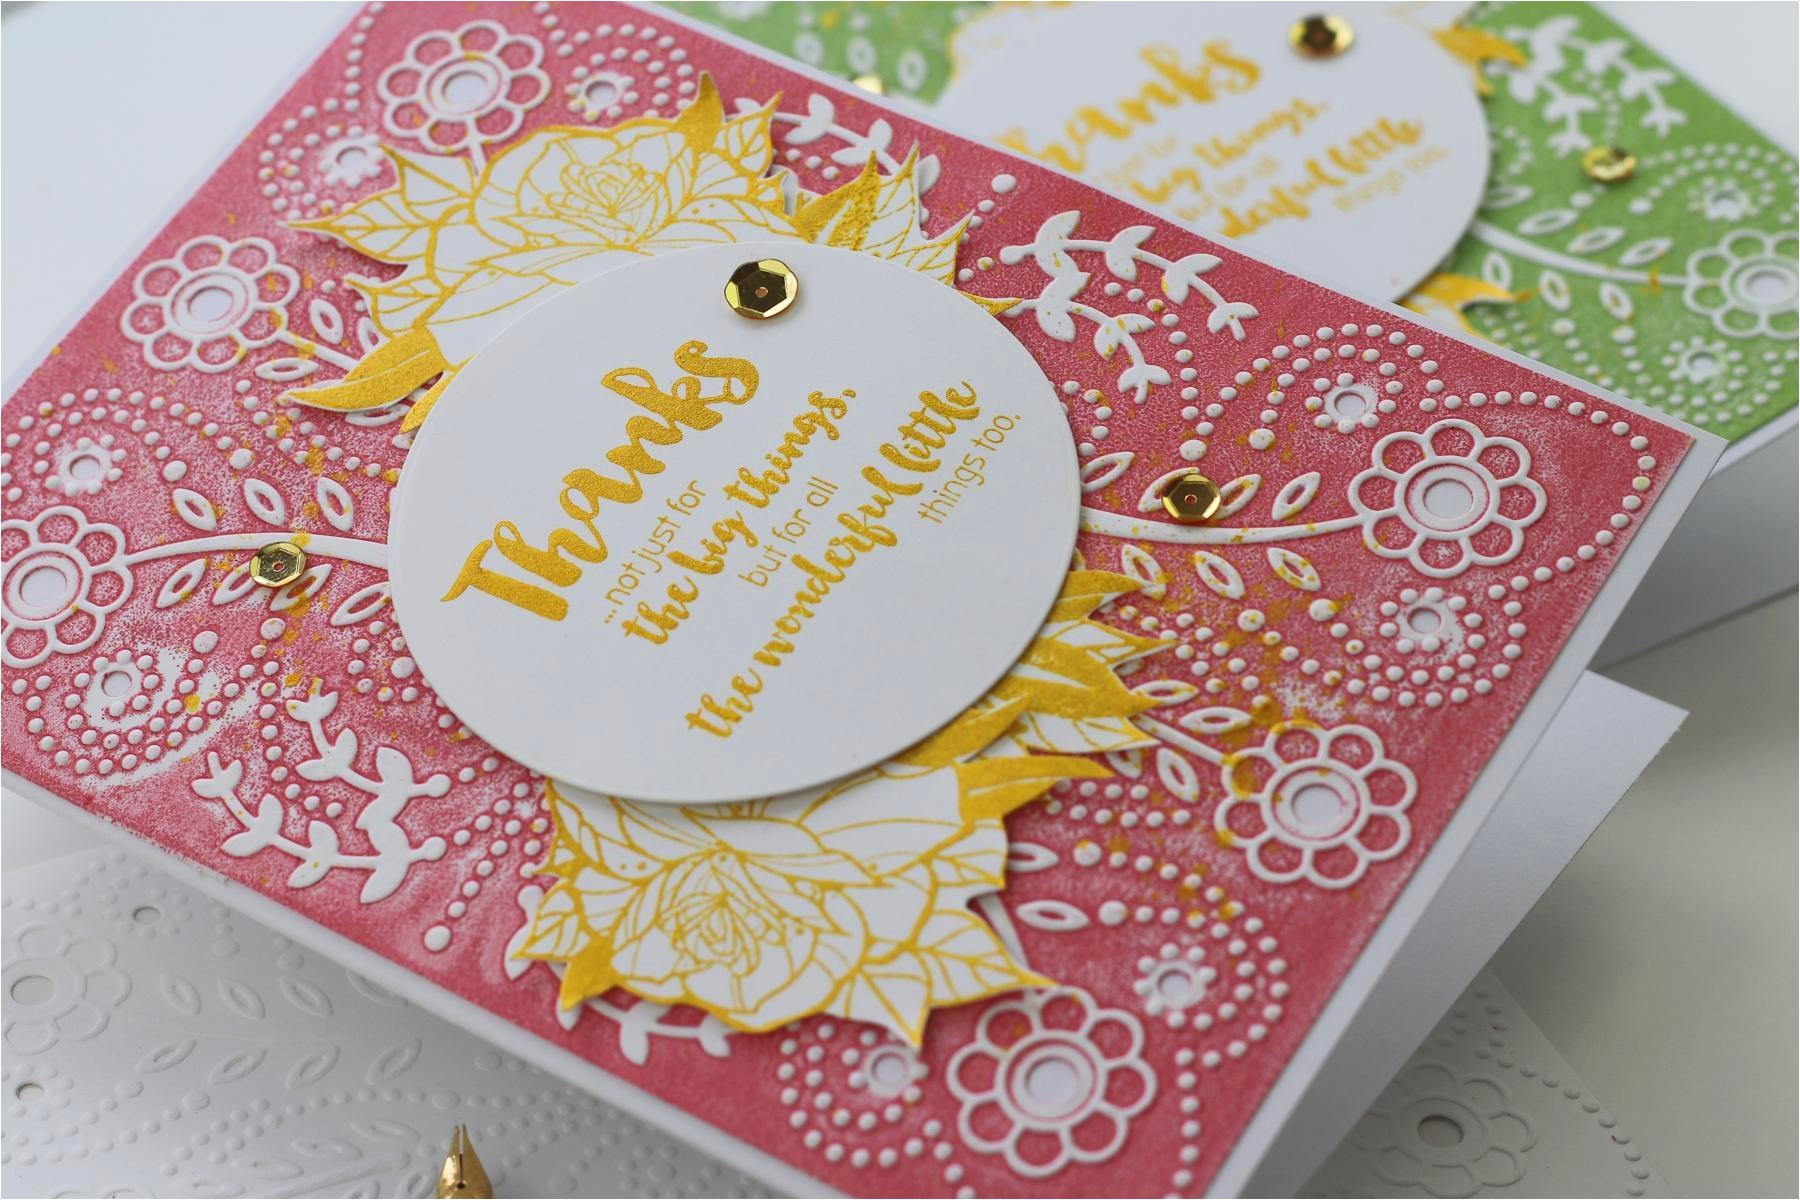 2 3 floral splash spellbinders cut emboss folder bibi cameron 1 jpg